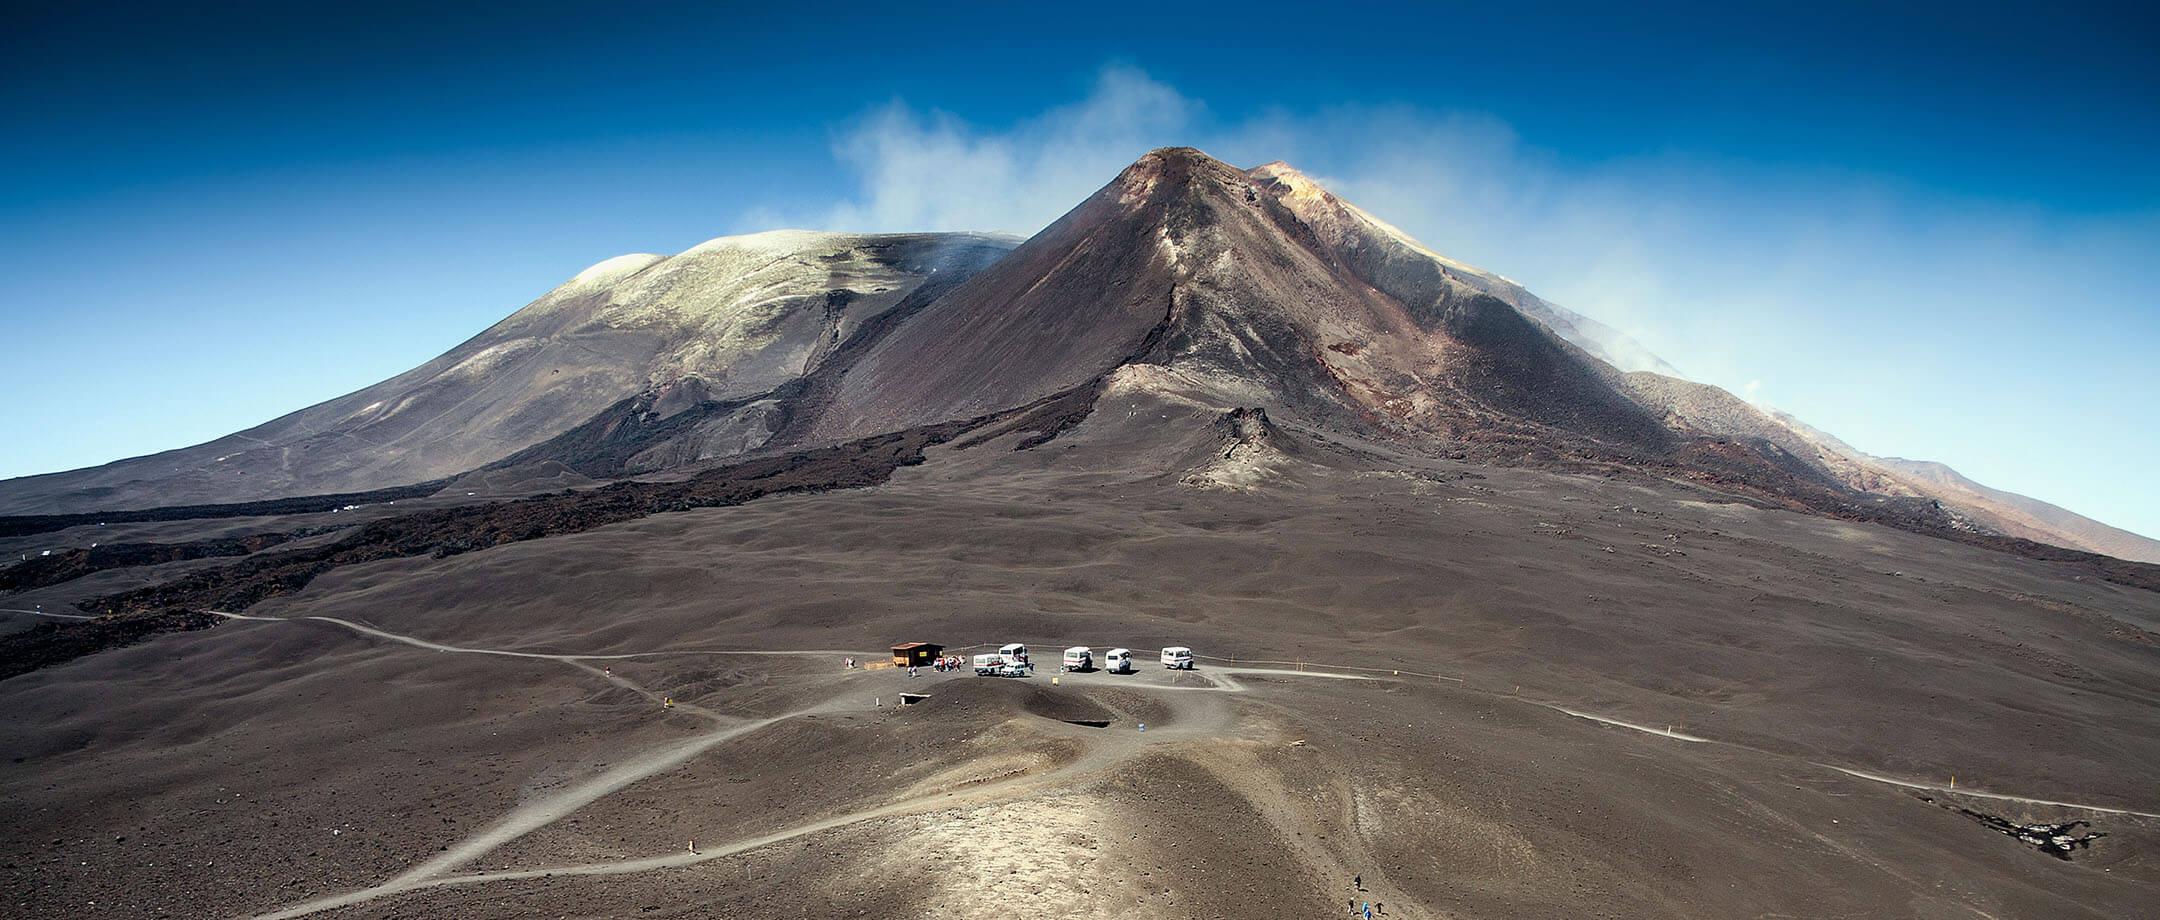 Mount Etna Summit Excursion